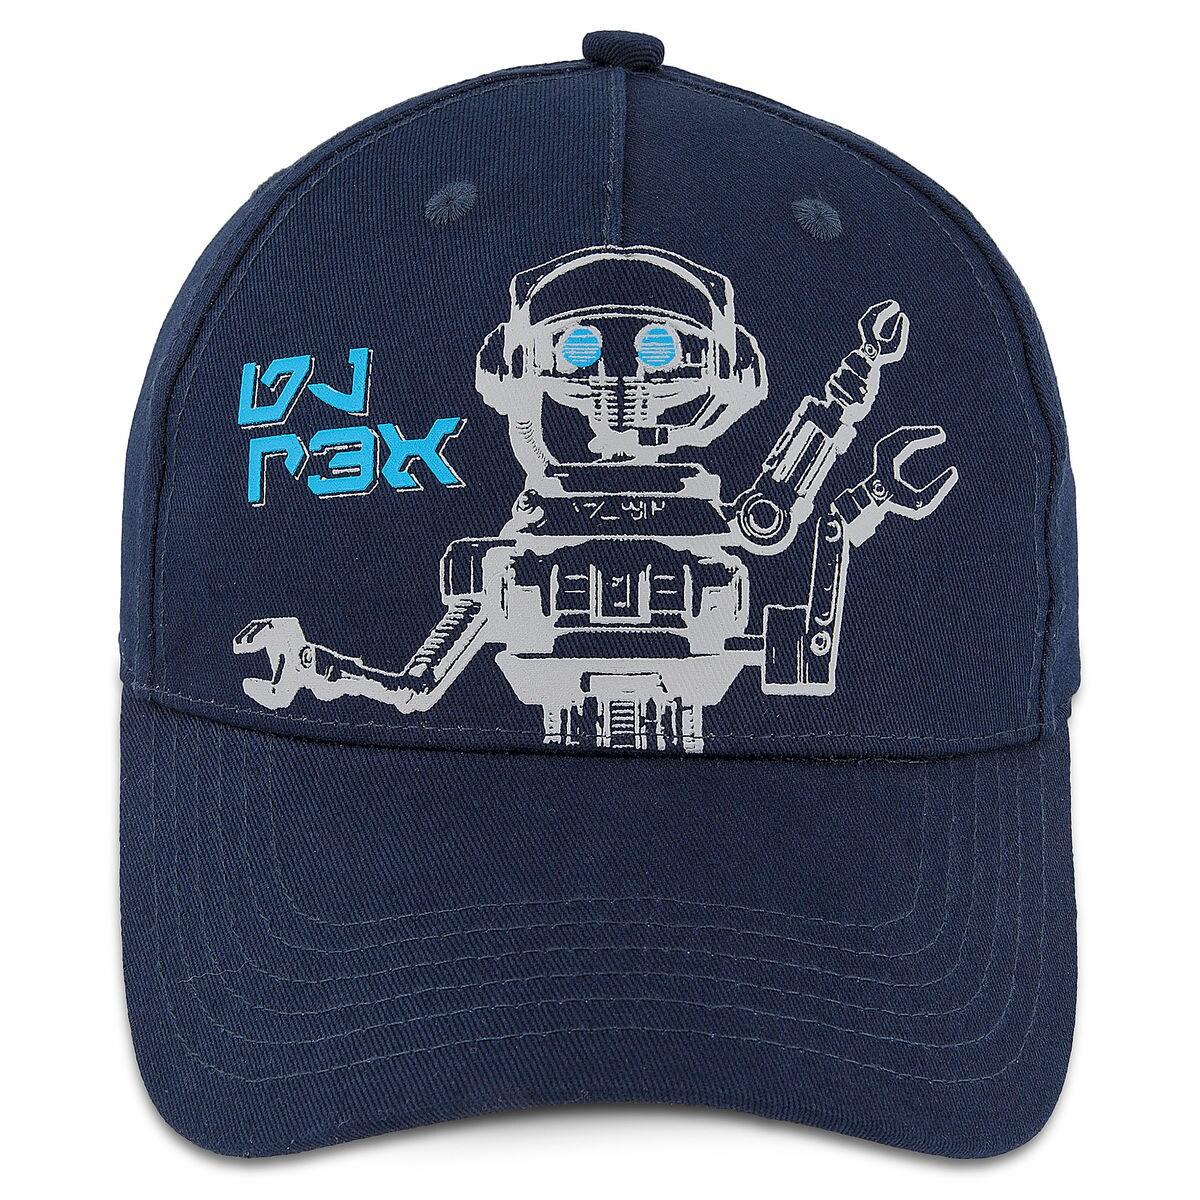 Product Image of DJ Rex Baseball Cap for Kids - Star Wars  Galaxy s Edge   defc800ebda0